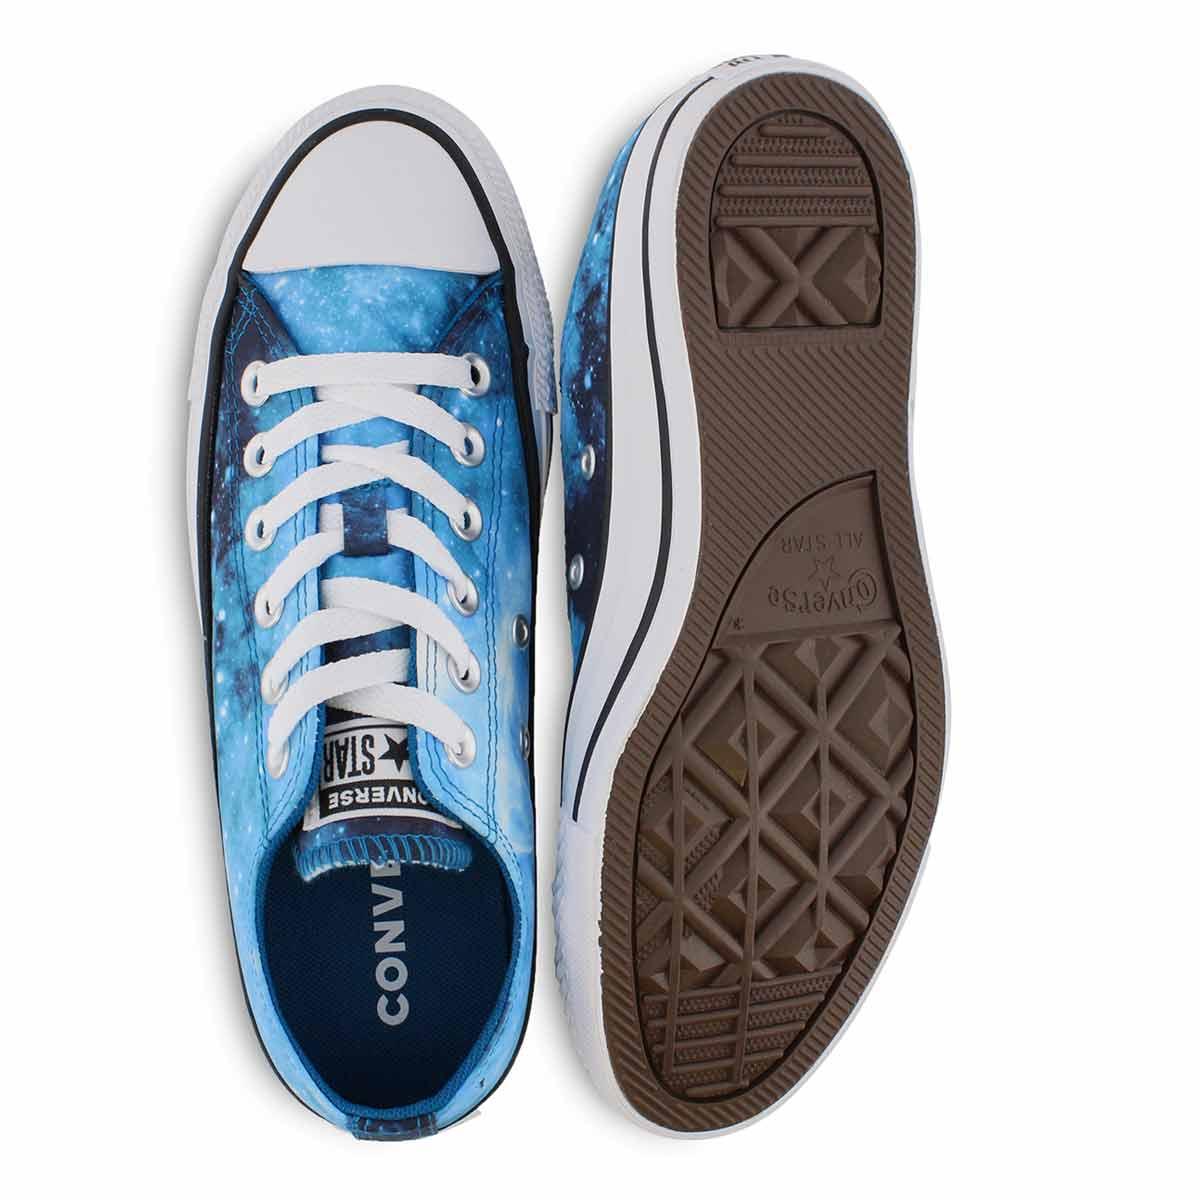 Converse-Women-039-s-Chuck-Taylor-All-Star-Miss-Galaxy-Ox-Sneaker miniature 7